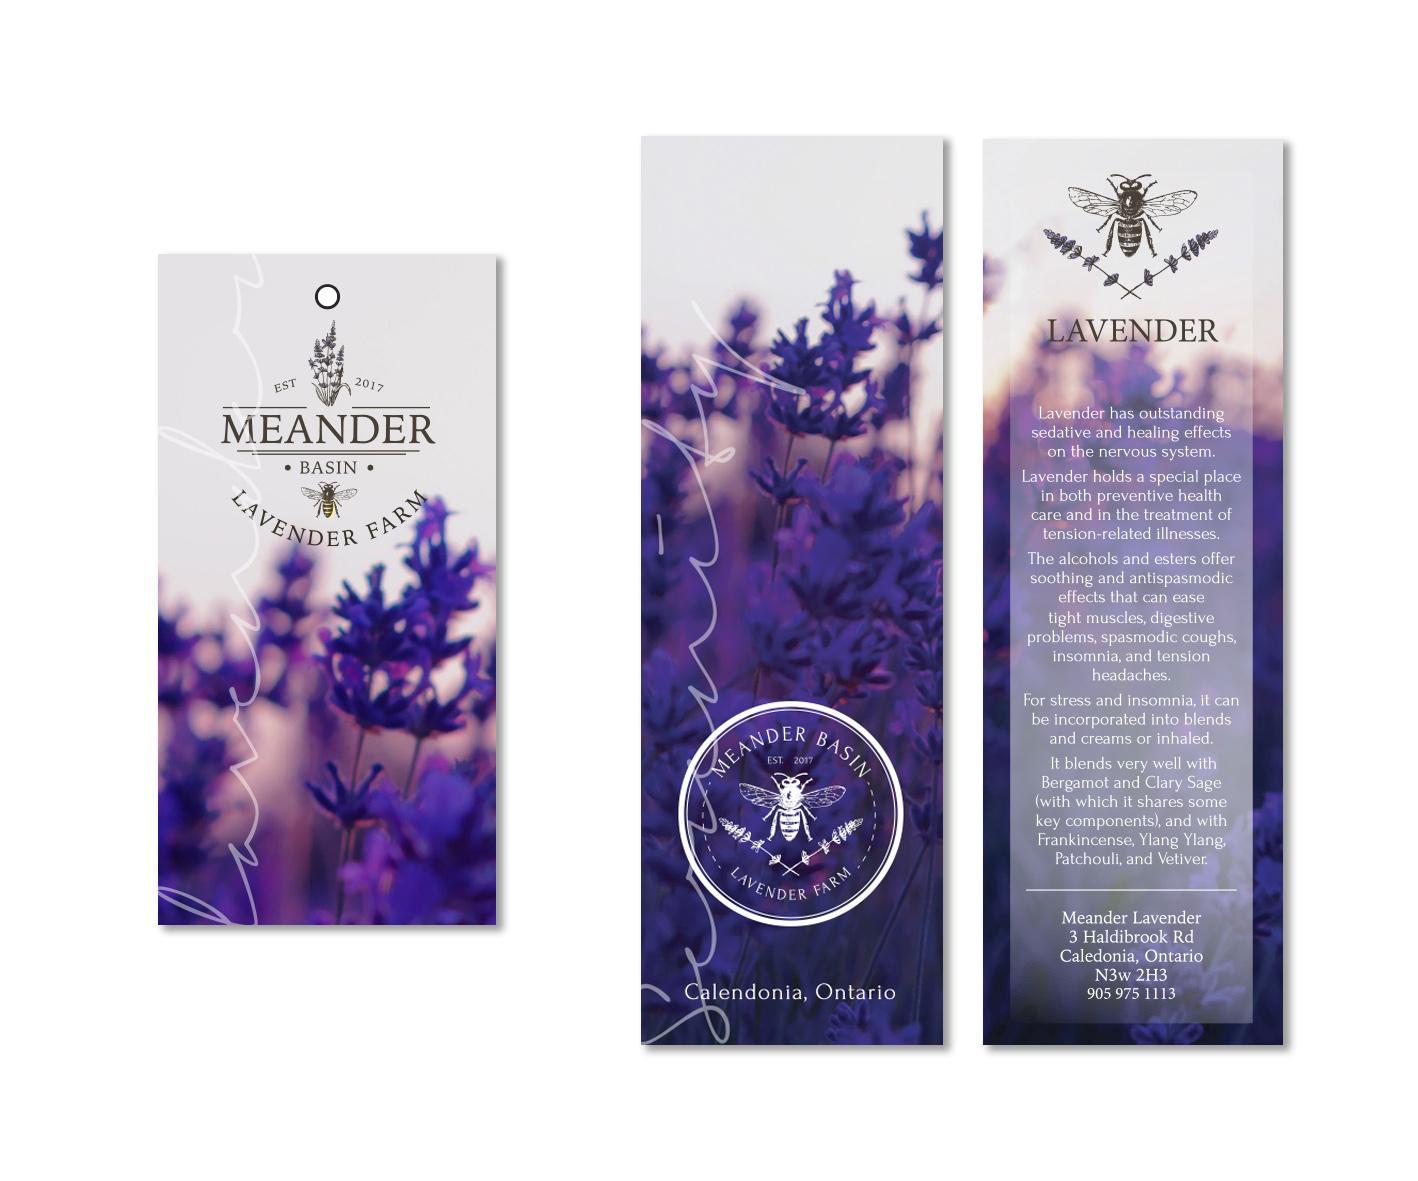 Meander Basin Lavender Farm Stationery Design by Billie Hardy Creative